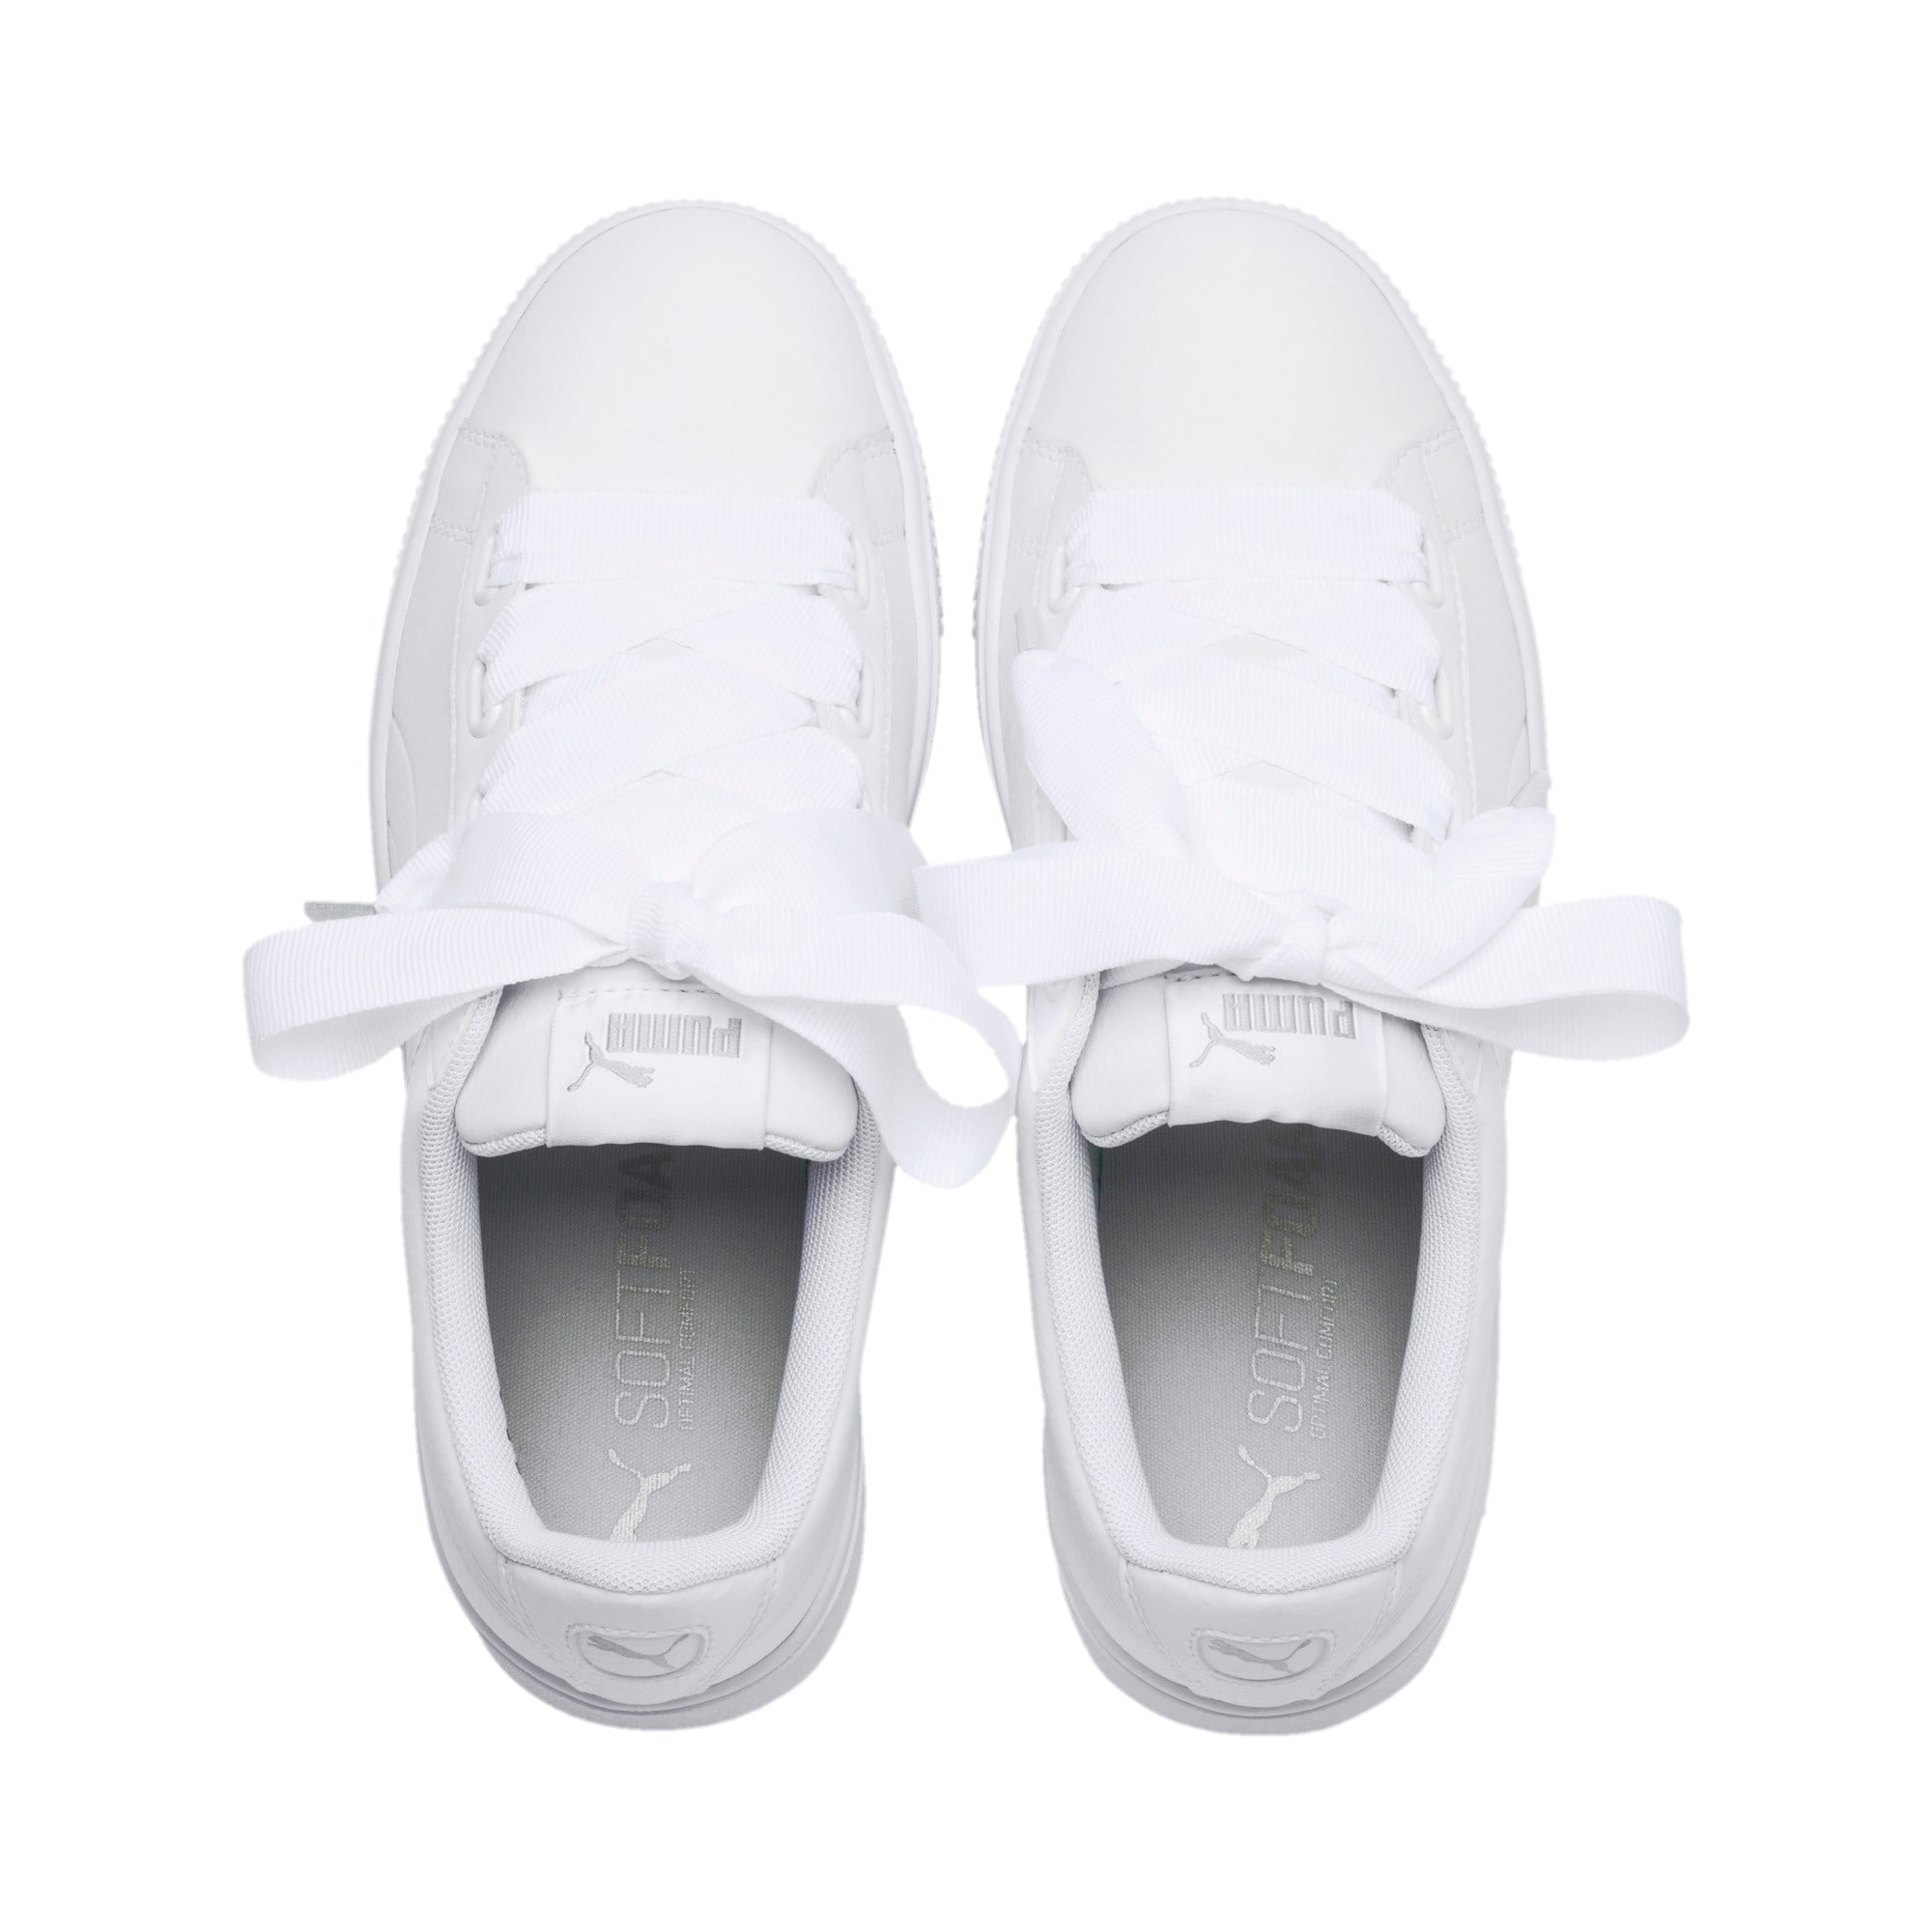 Thumbnail 6 of PUMA Vikky Stacked Ribbon Core Women's Sneakers, Puma White-Puma White, medium